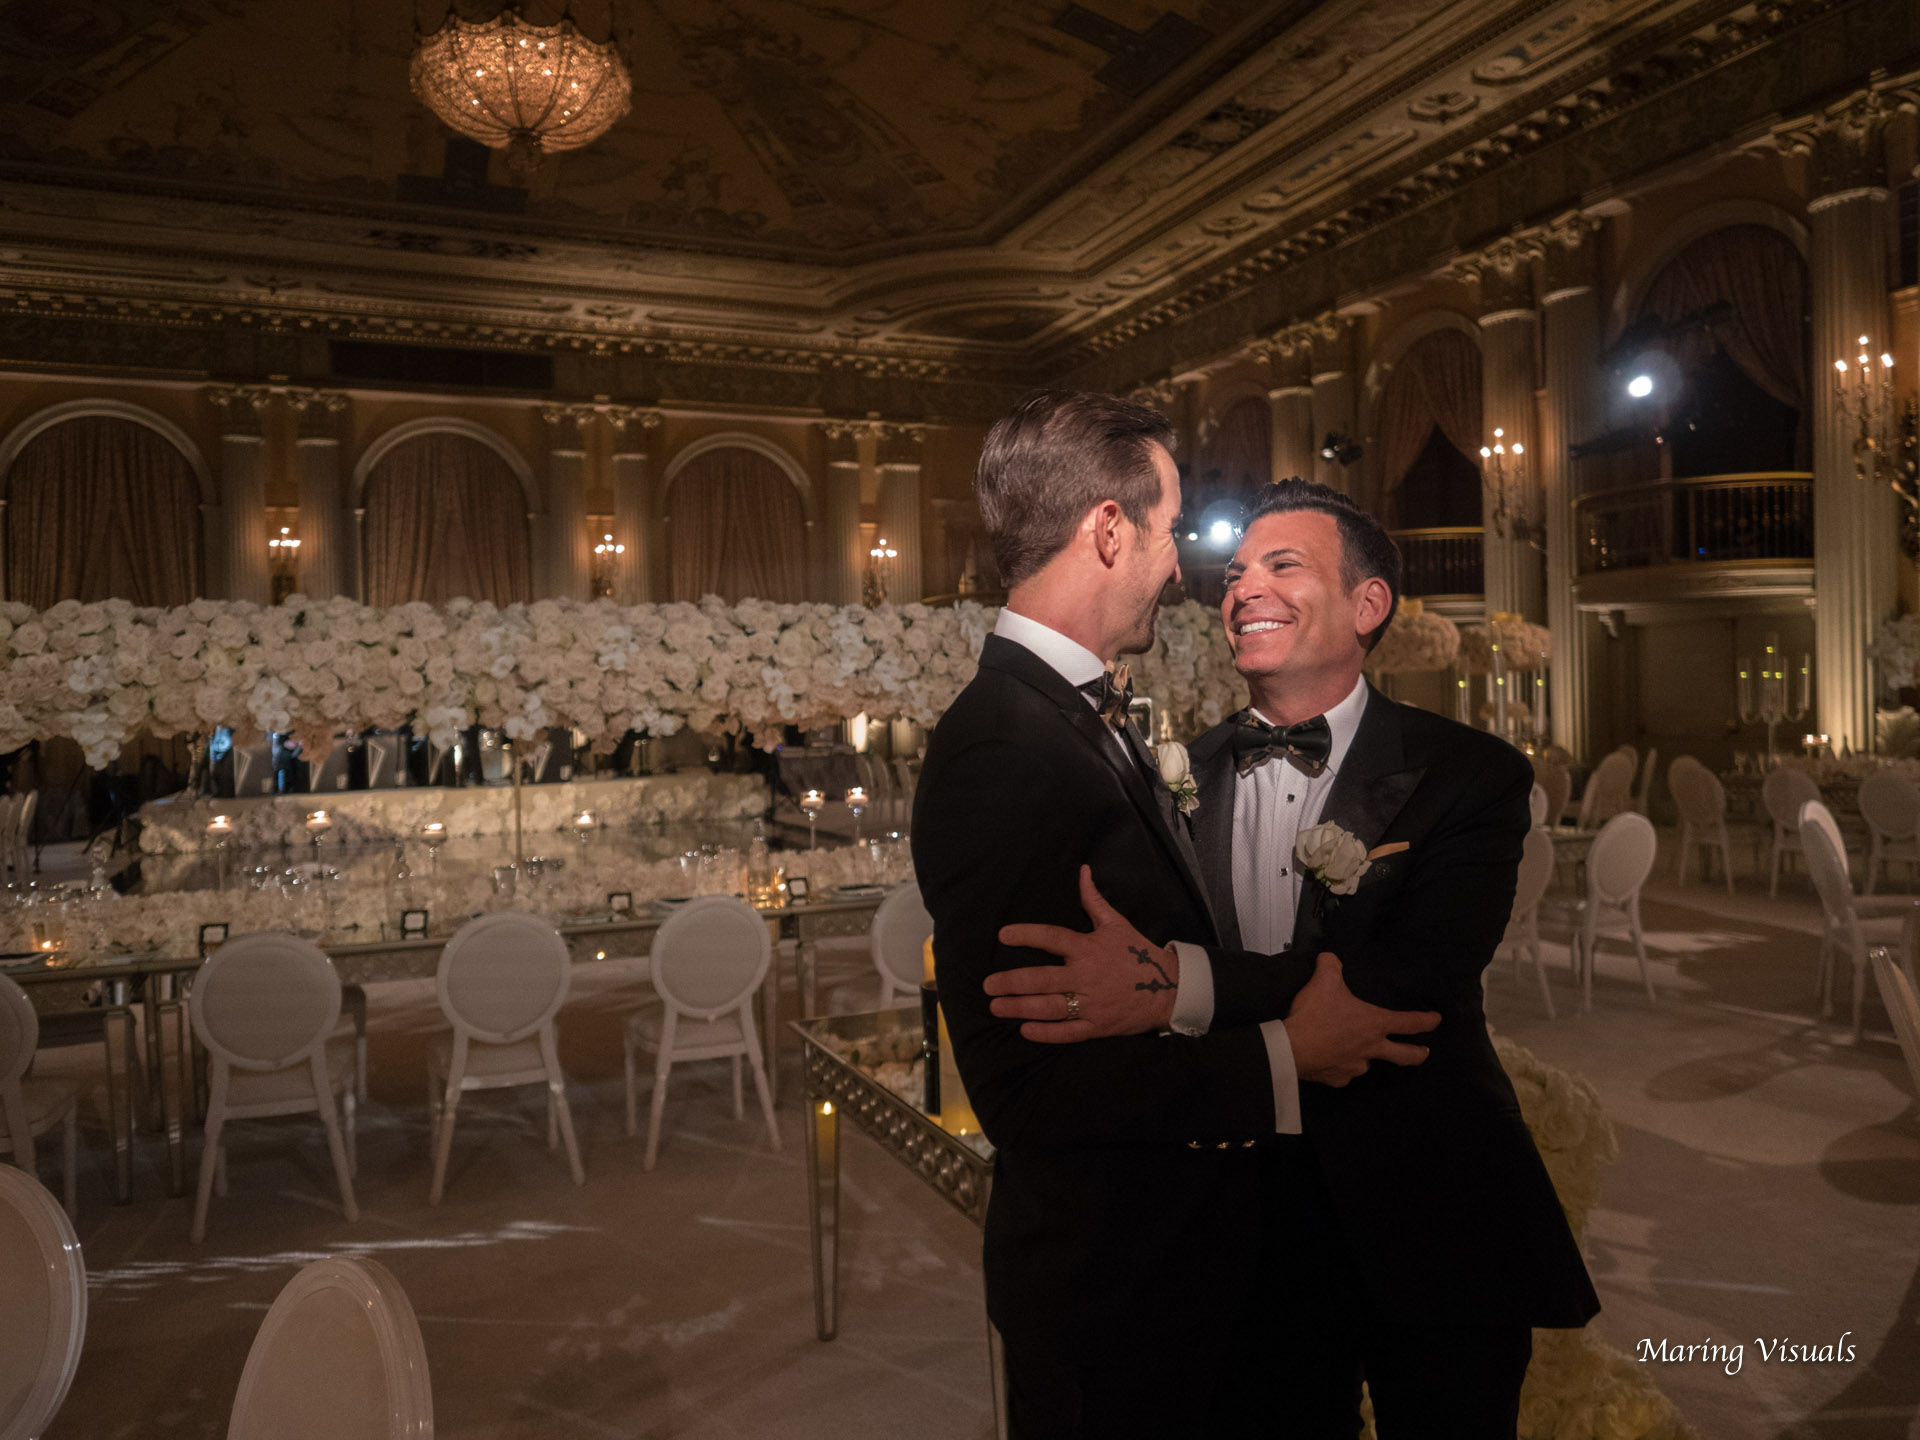 David Tutera Weddings by Maring Visuals 00553.jpg